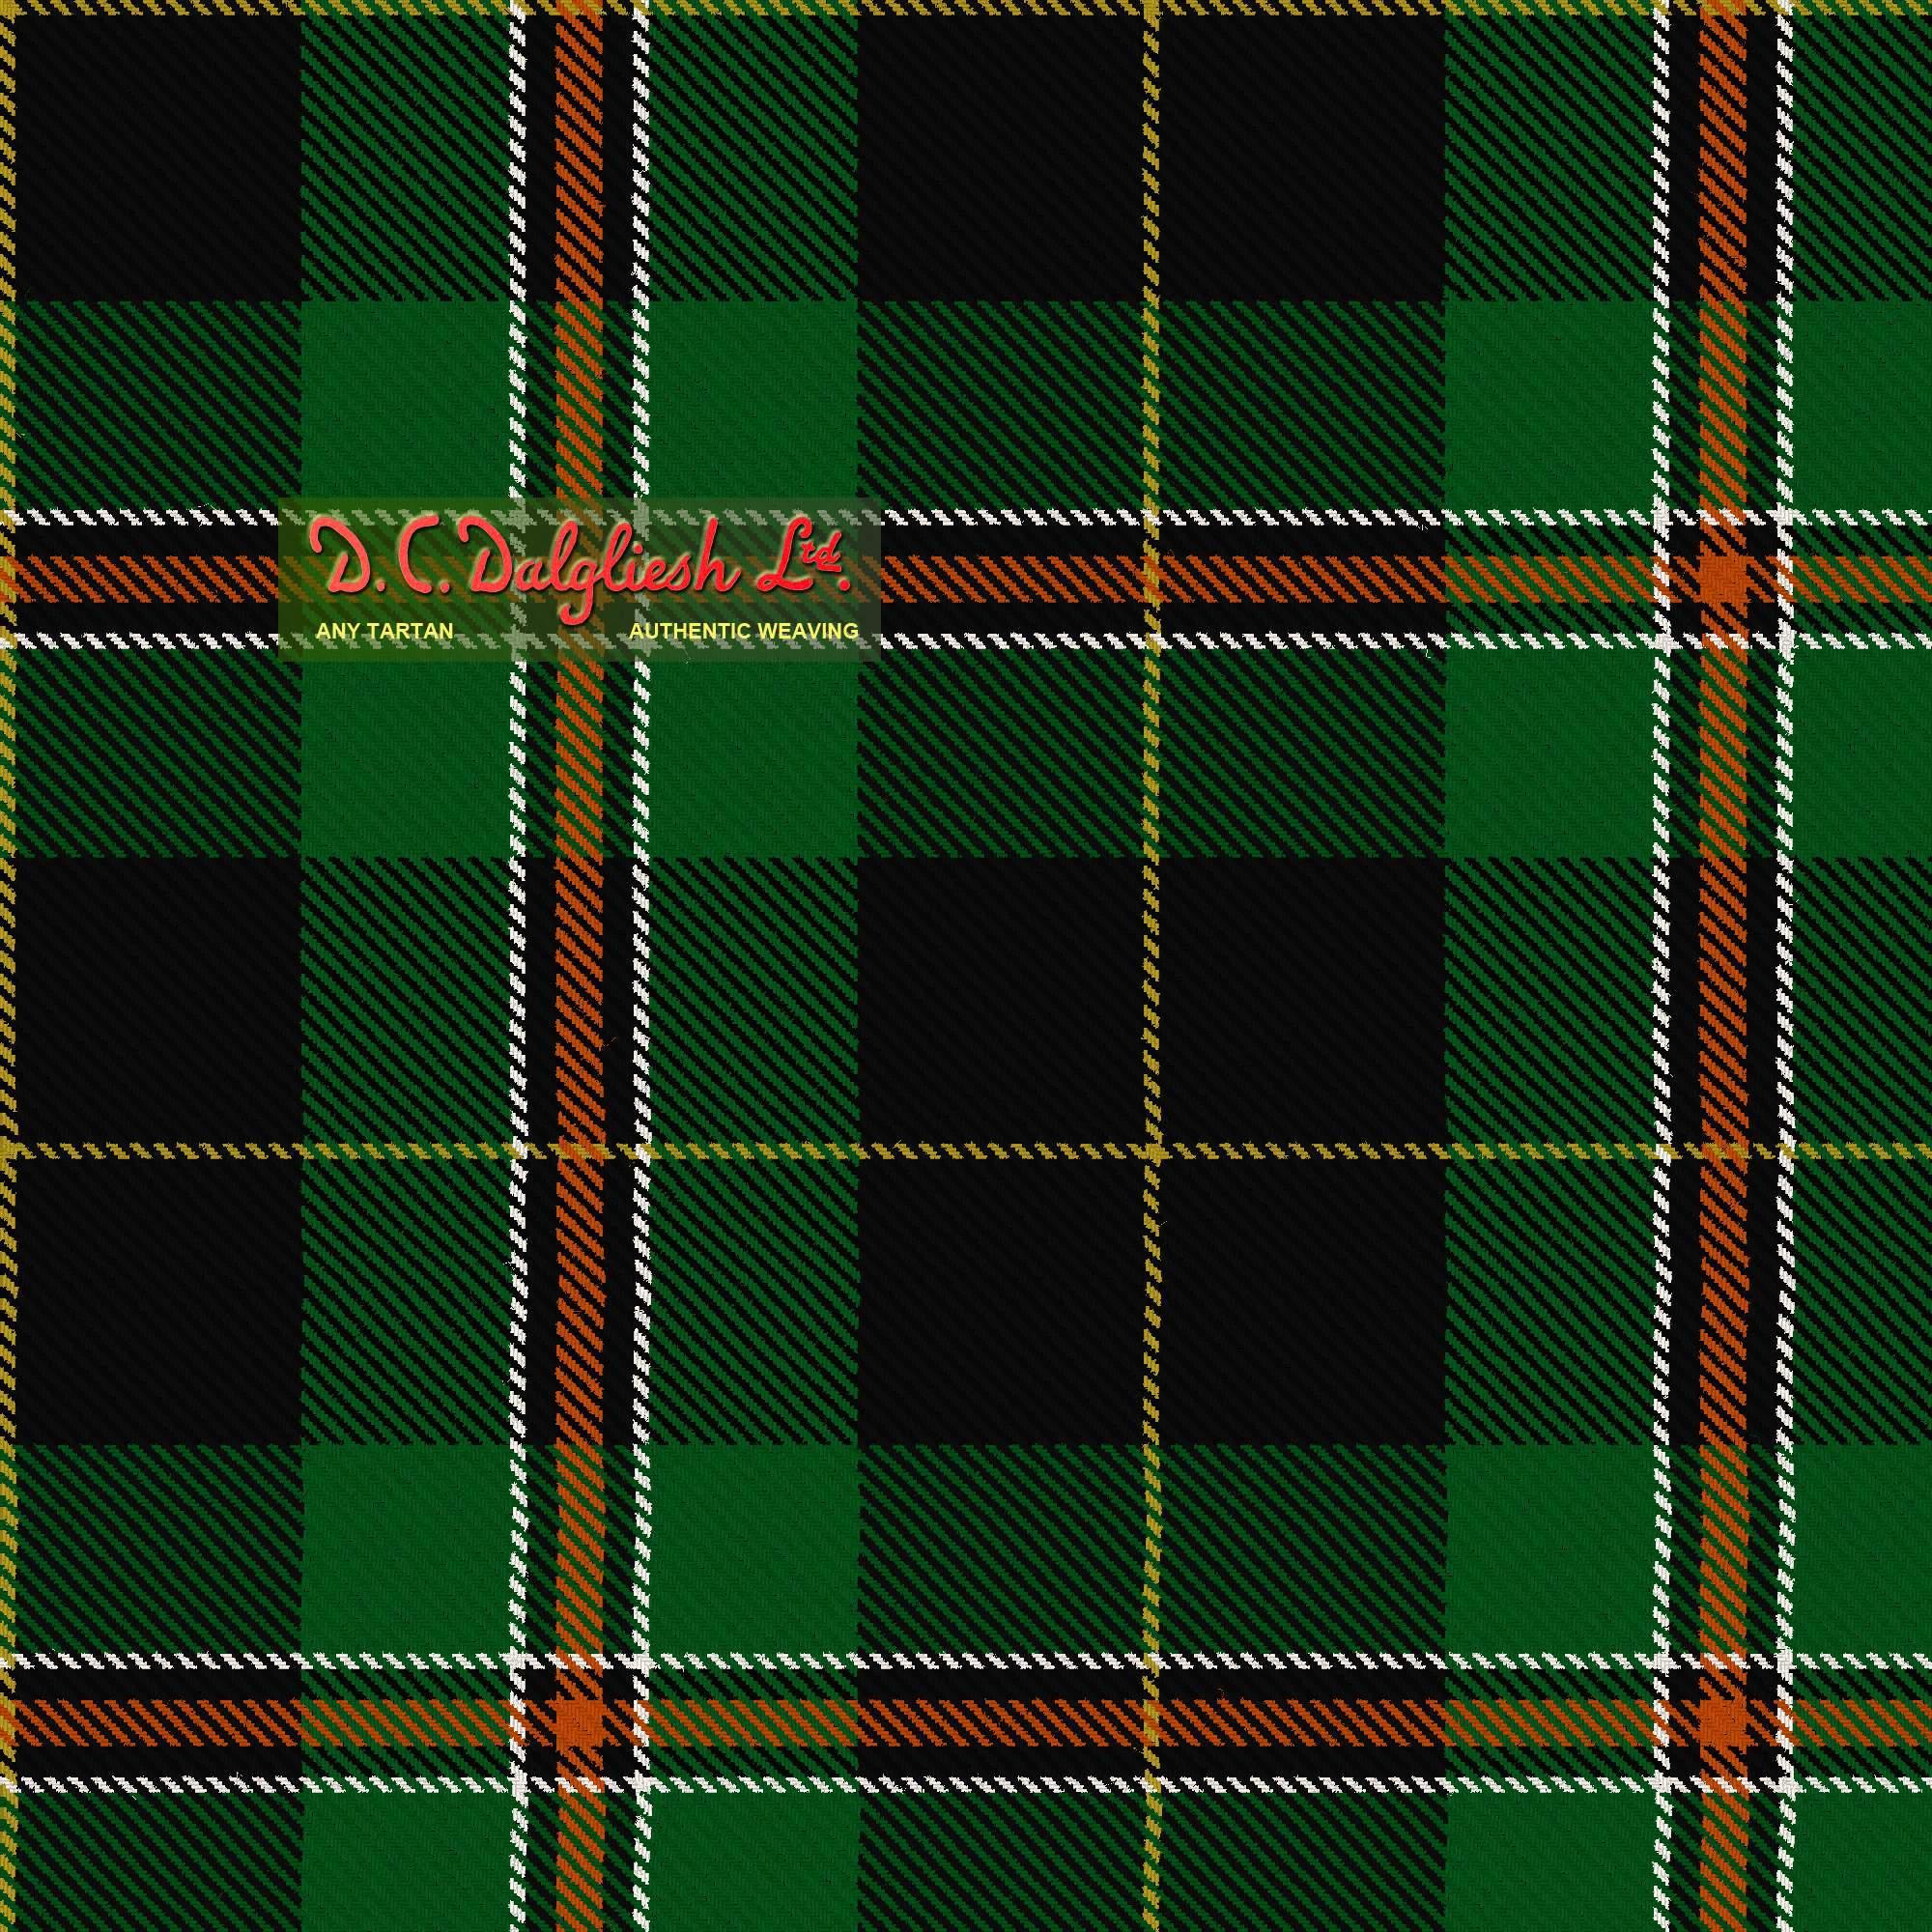 Highlands Of Durham 2 Fabric By Dc Dalgliesh Hand